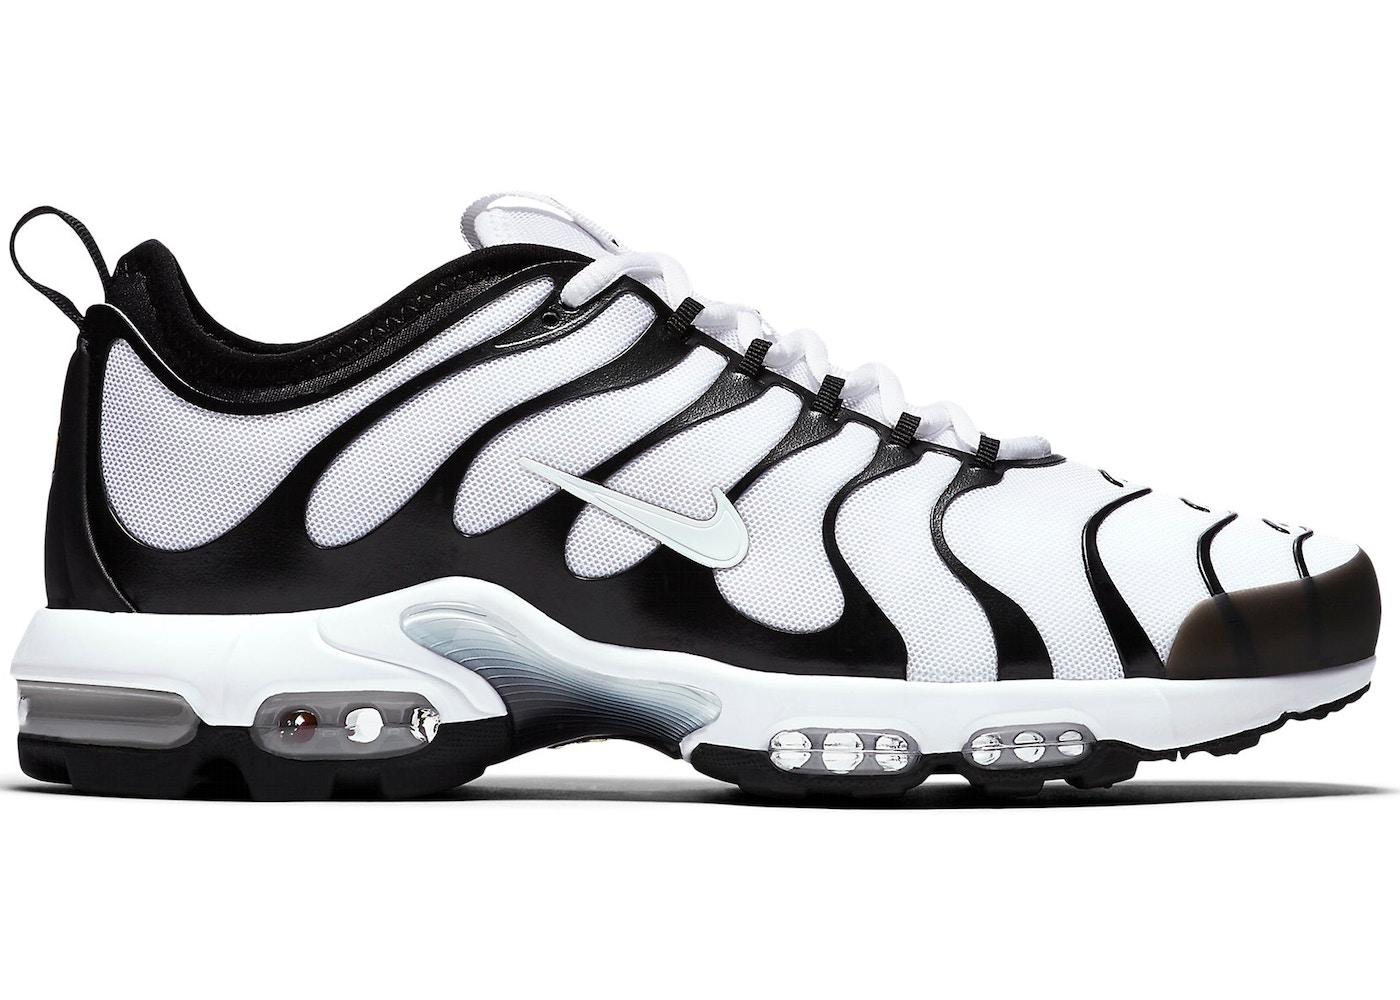 sports shoes 8ea50 60f09 nike airmax plus tn